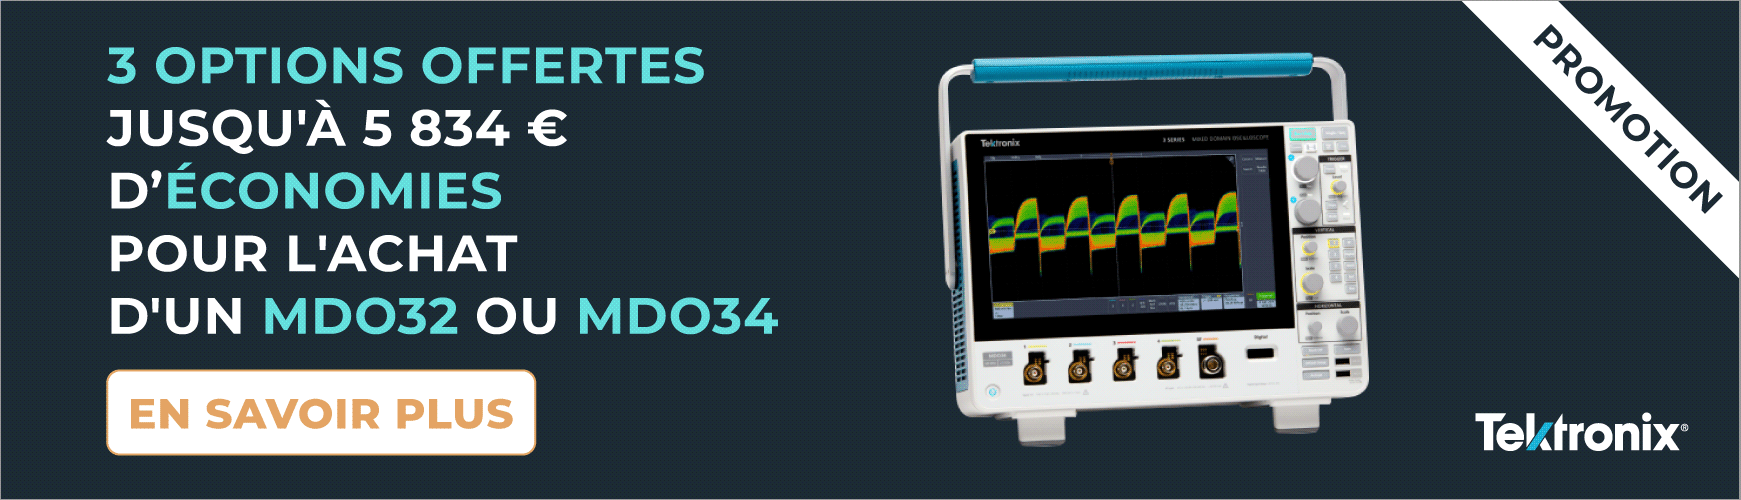 3 OPTIONS GRATUITES POUR L'ACHAT D'UN OSCILLOSCOPE MDO32 OU MDO34 - TEKTRONIX